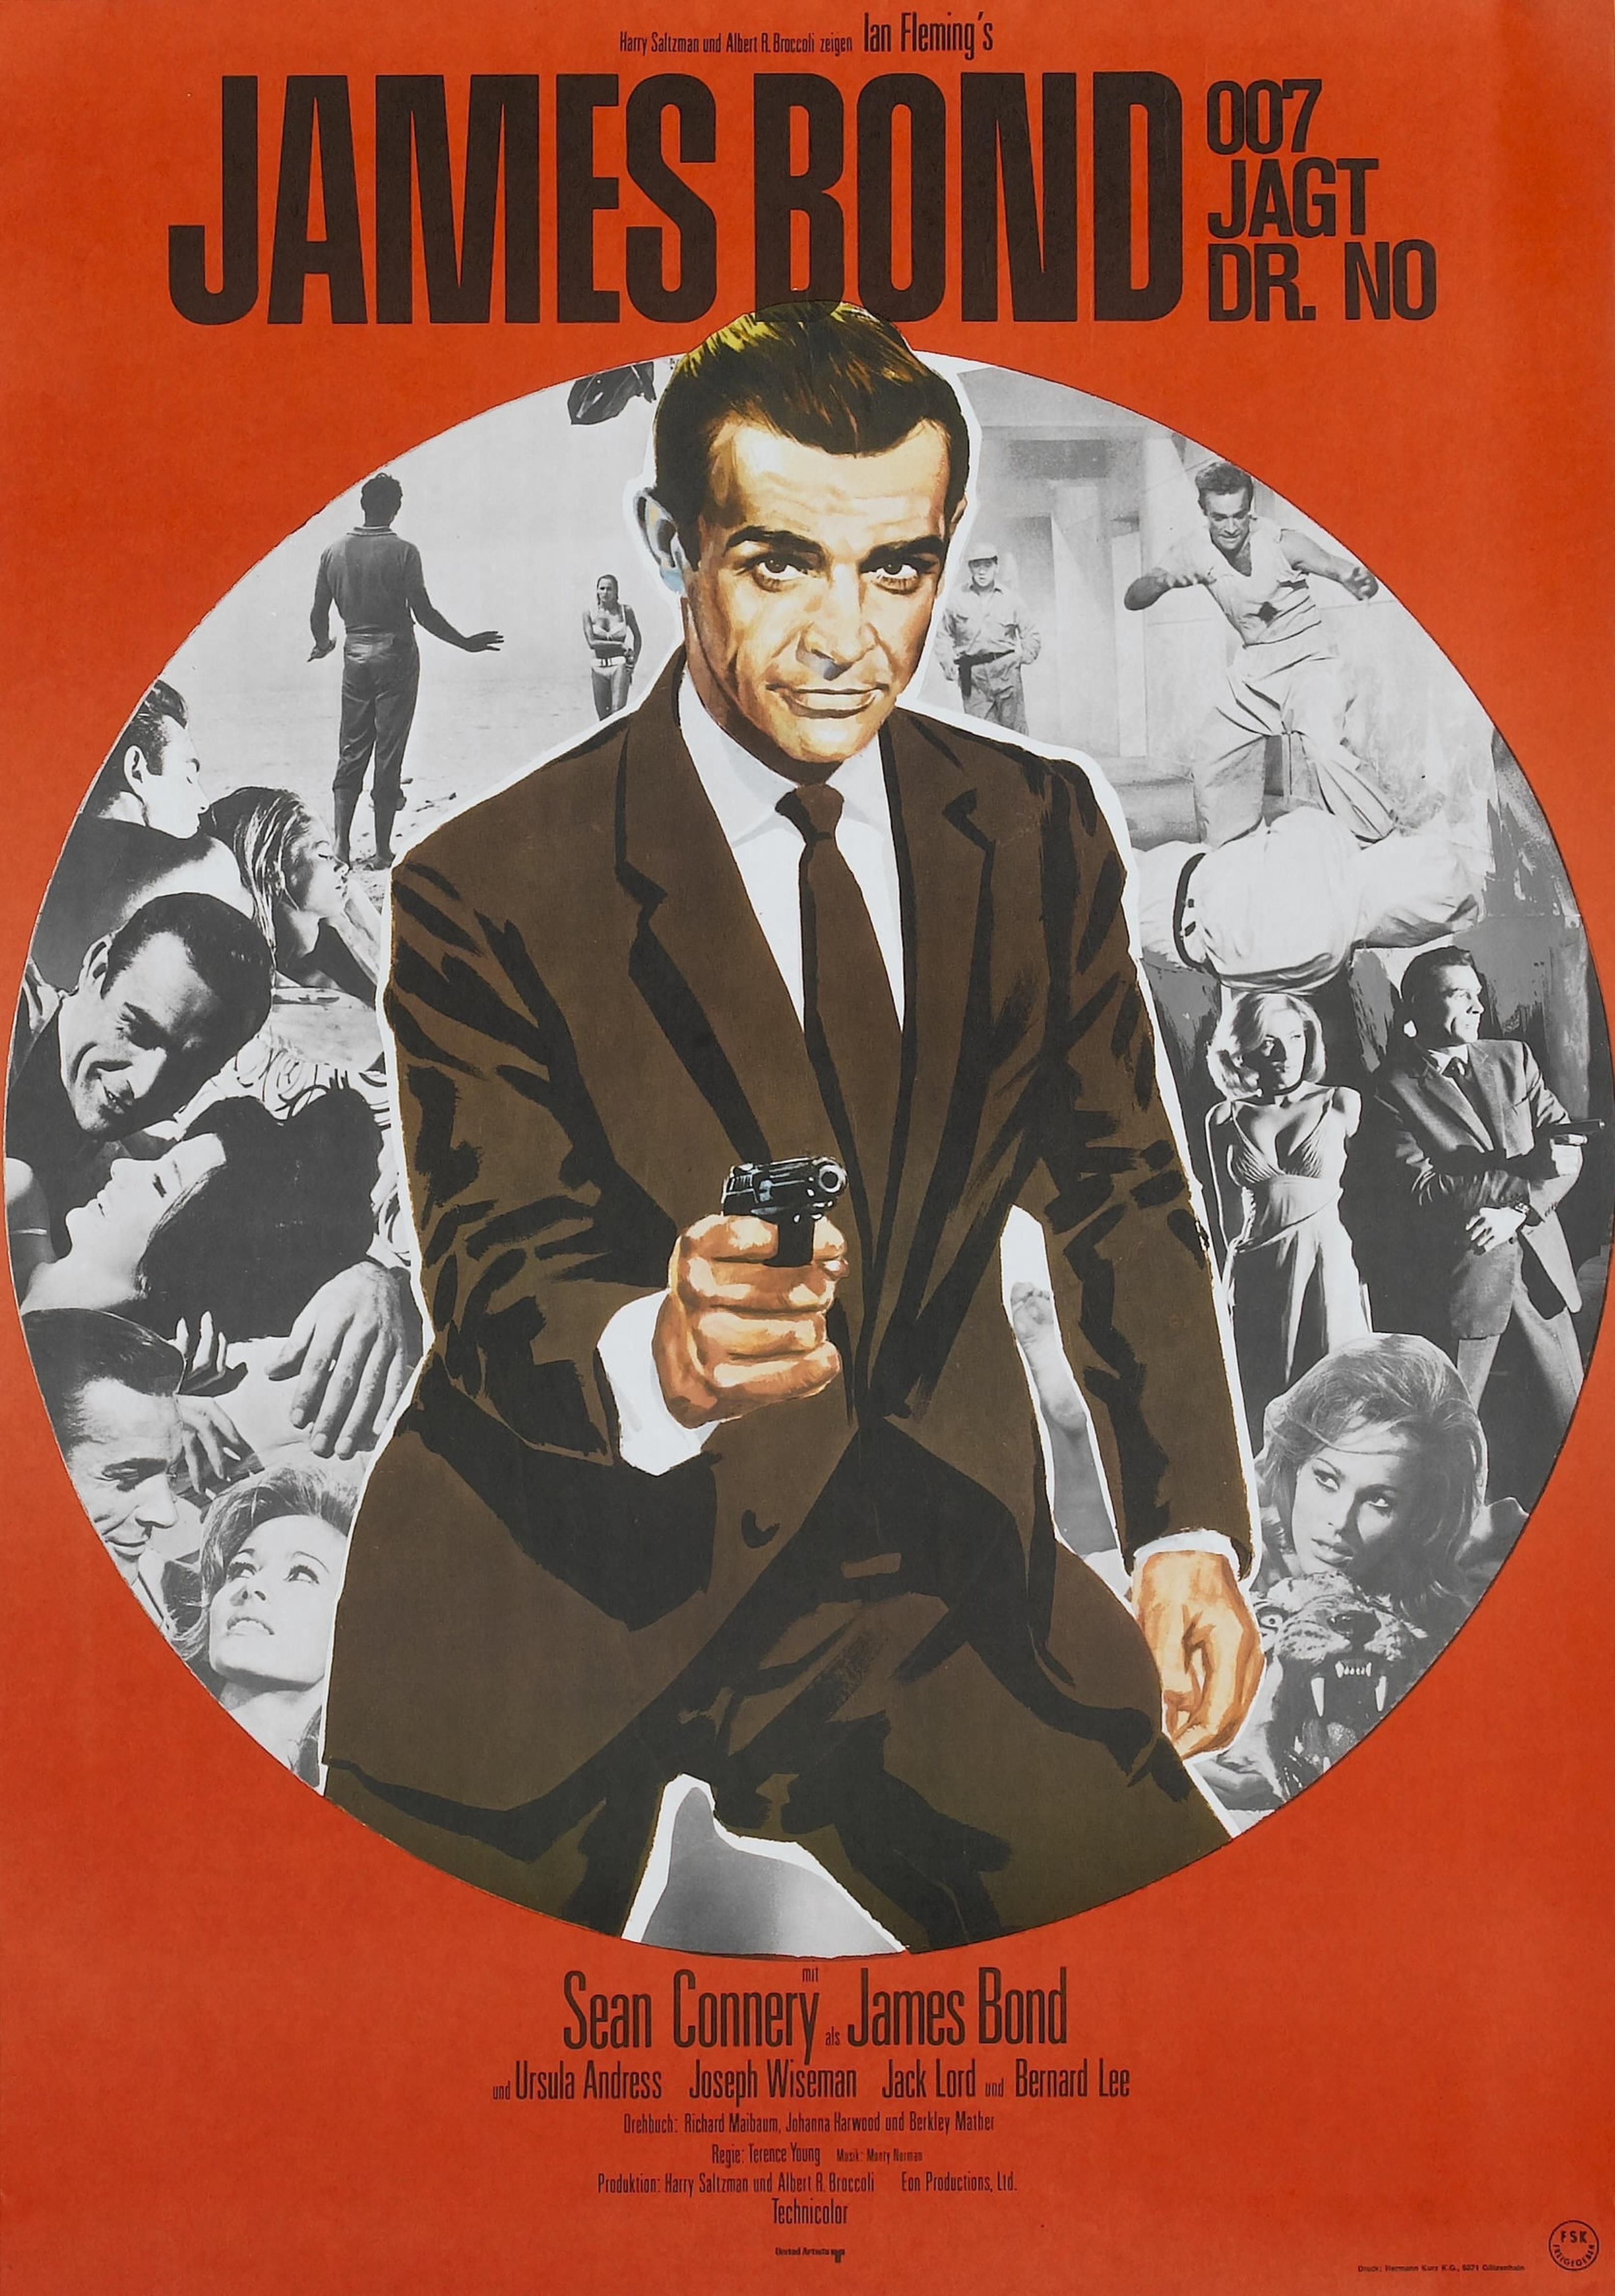 FRAMED James Bond Poster Prints Film Movie A3 A4 THUNDERBALL OCTOPUSSY 007 DR NO